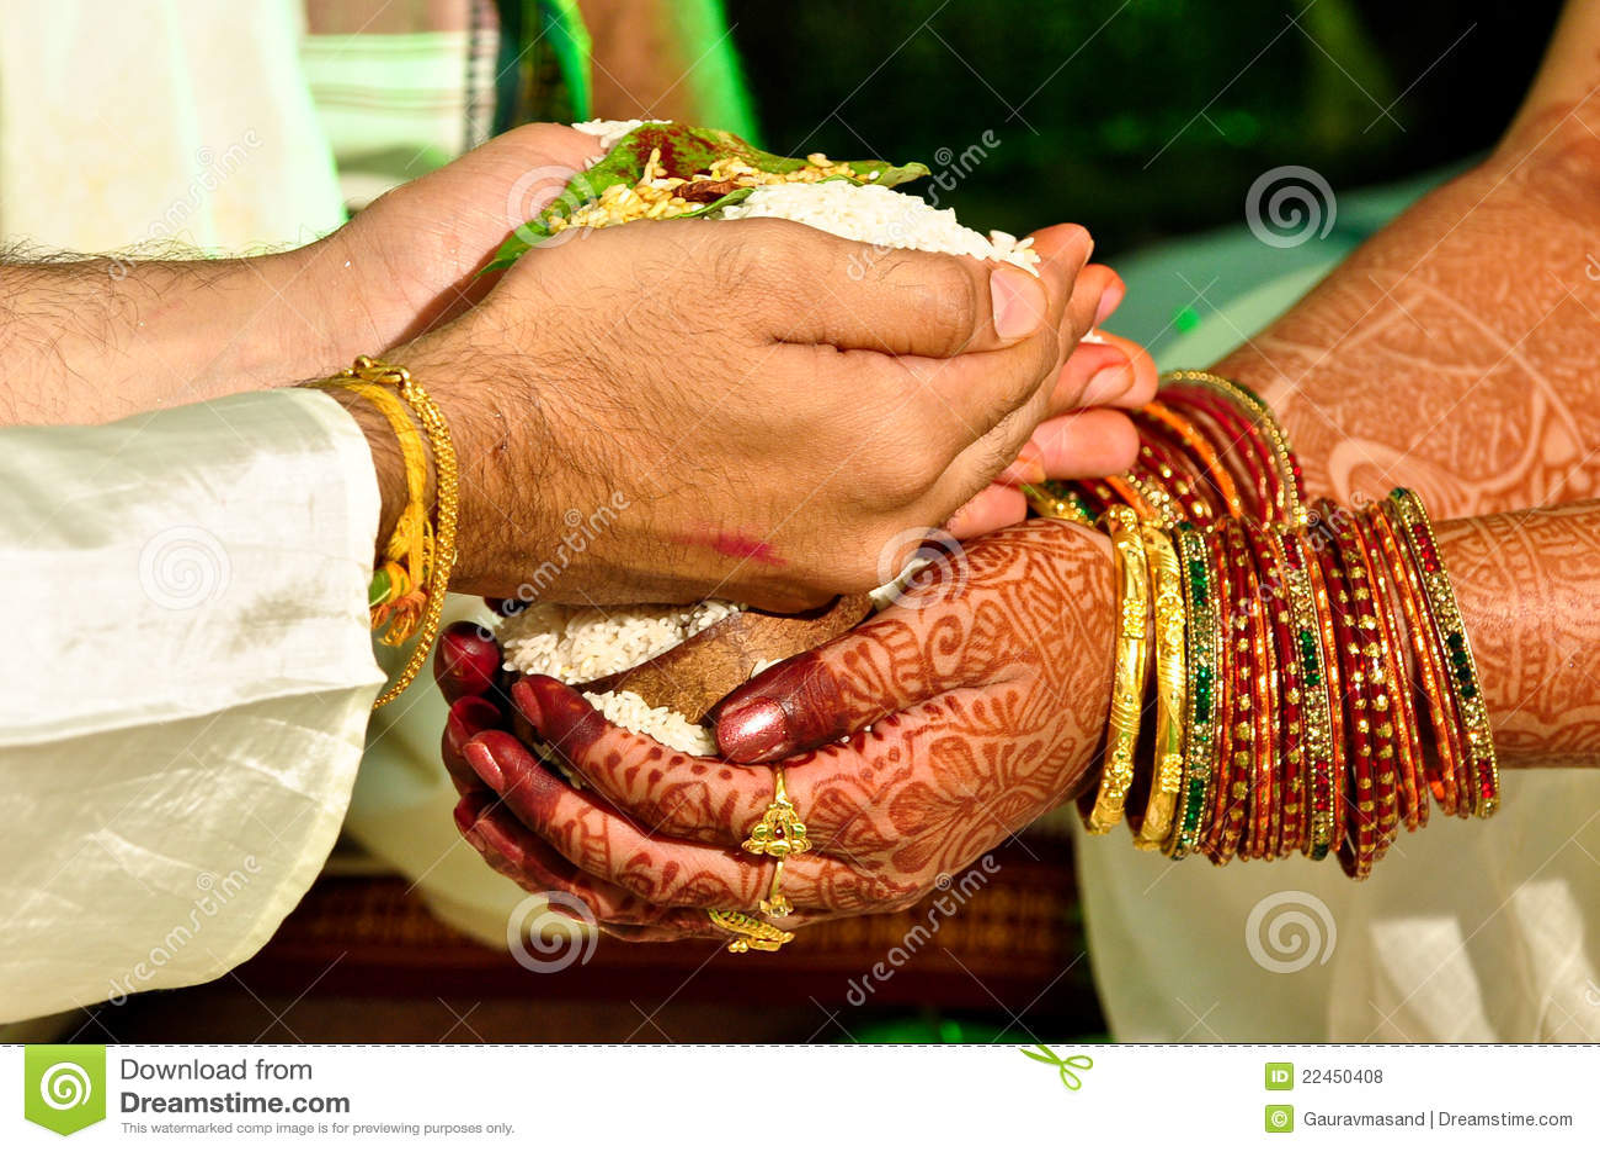 Mehndi Ceremony Clipart : Hindu wedding ritual royalty free stock photos image